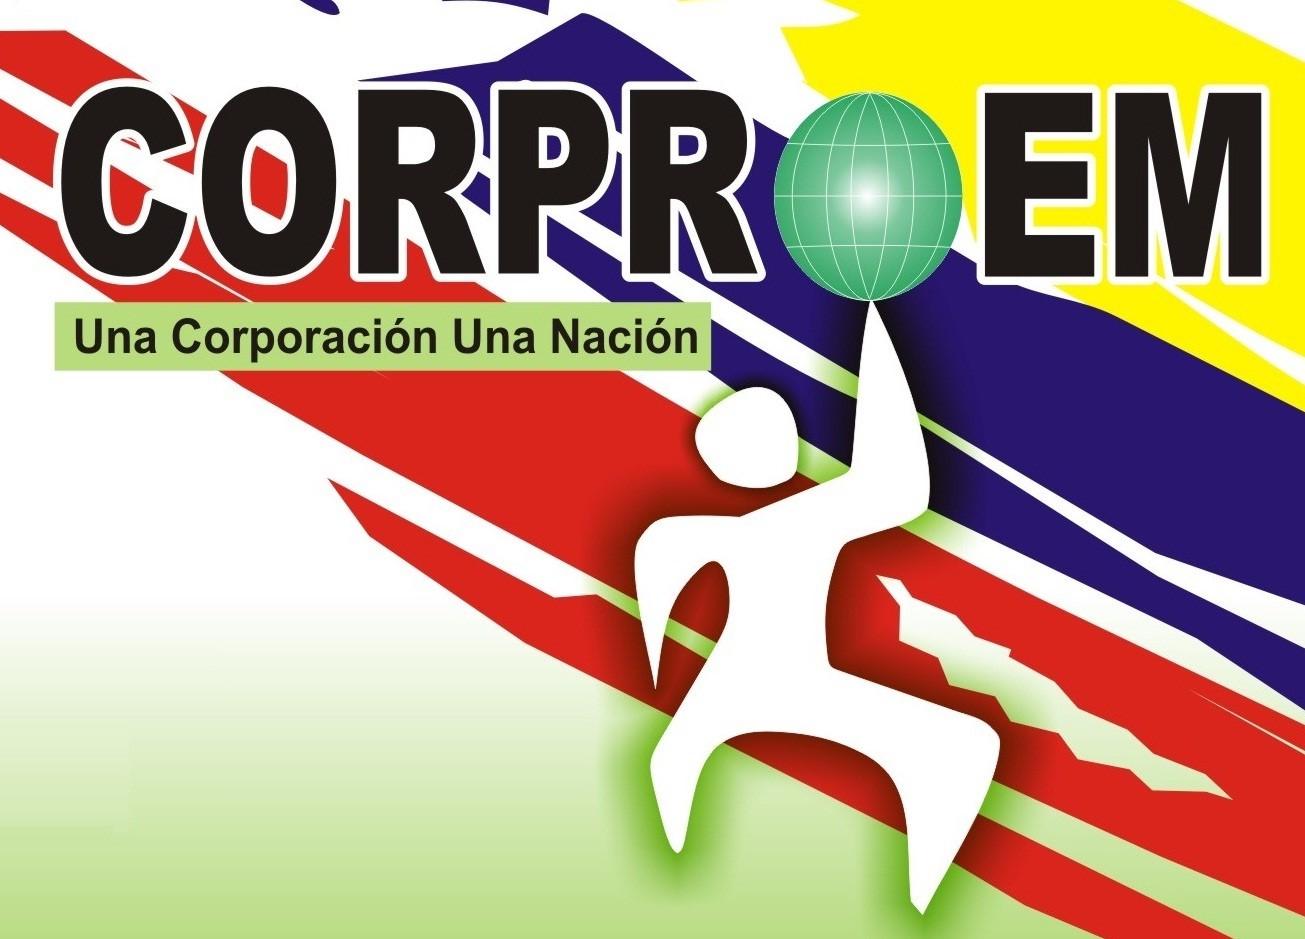 Corproem